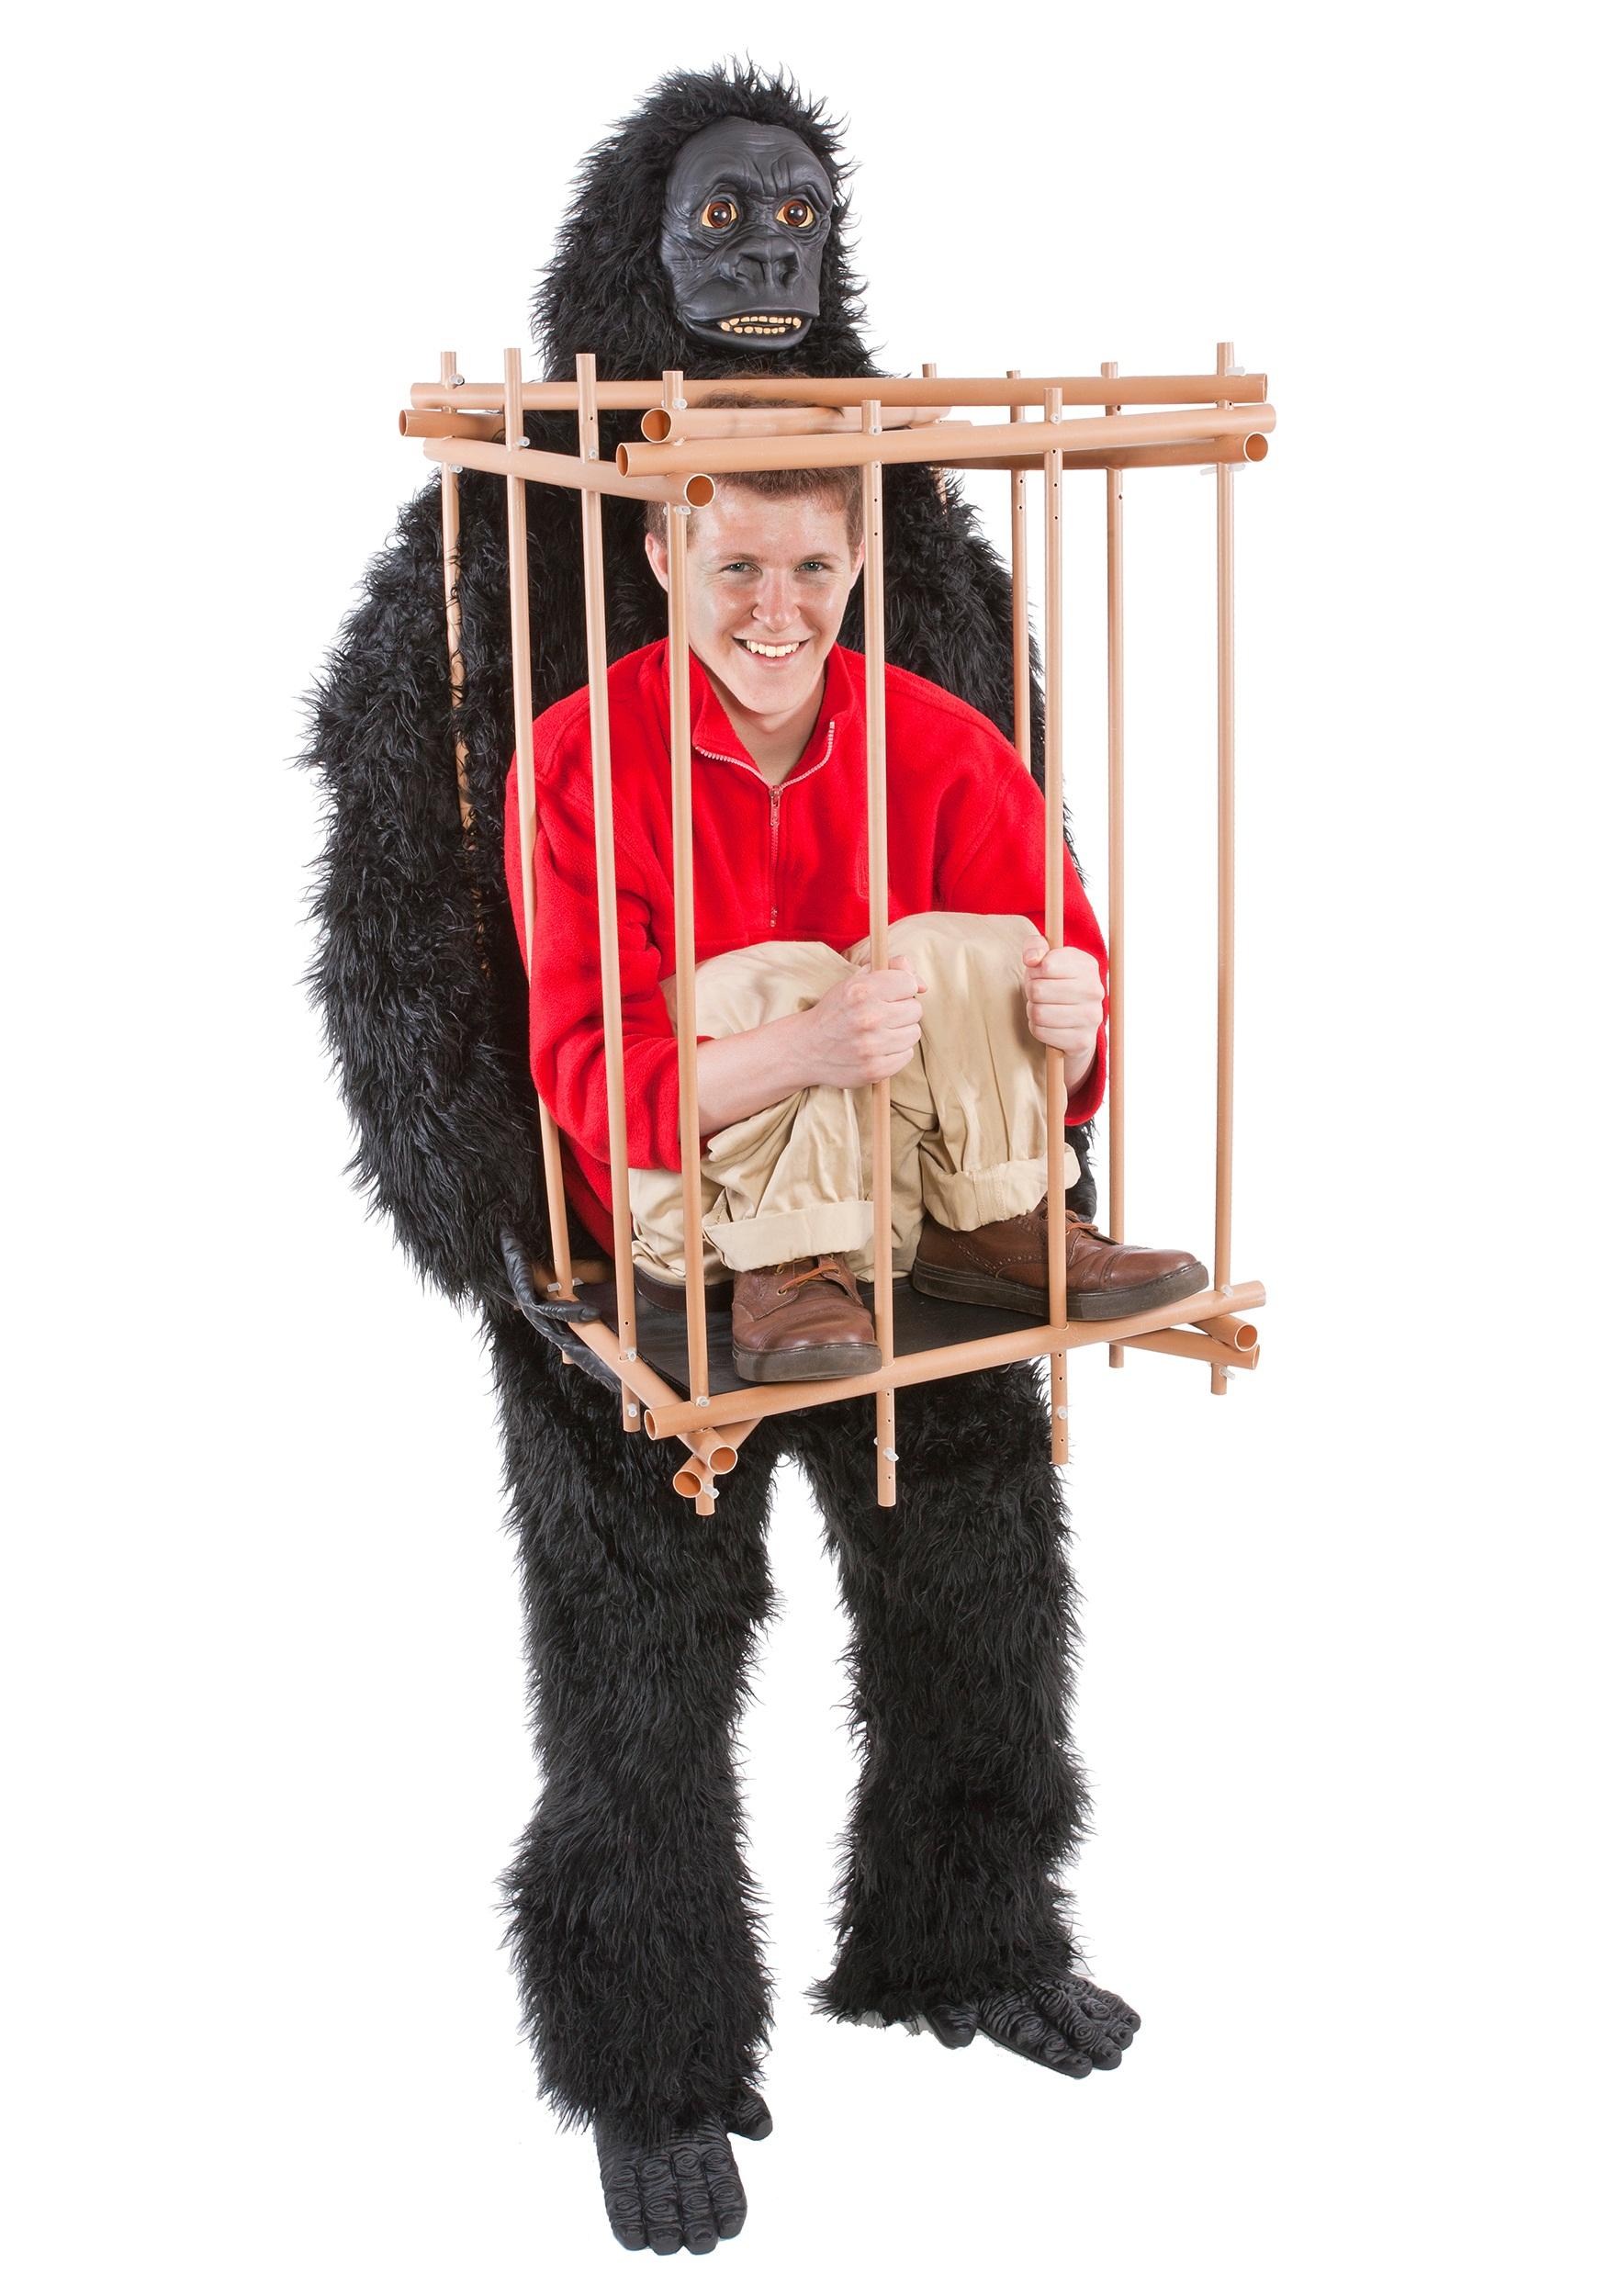 Costume Halloween Man.Man In A Gorilla Cage Costume